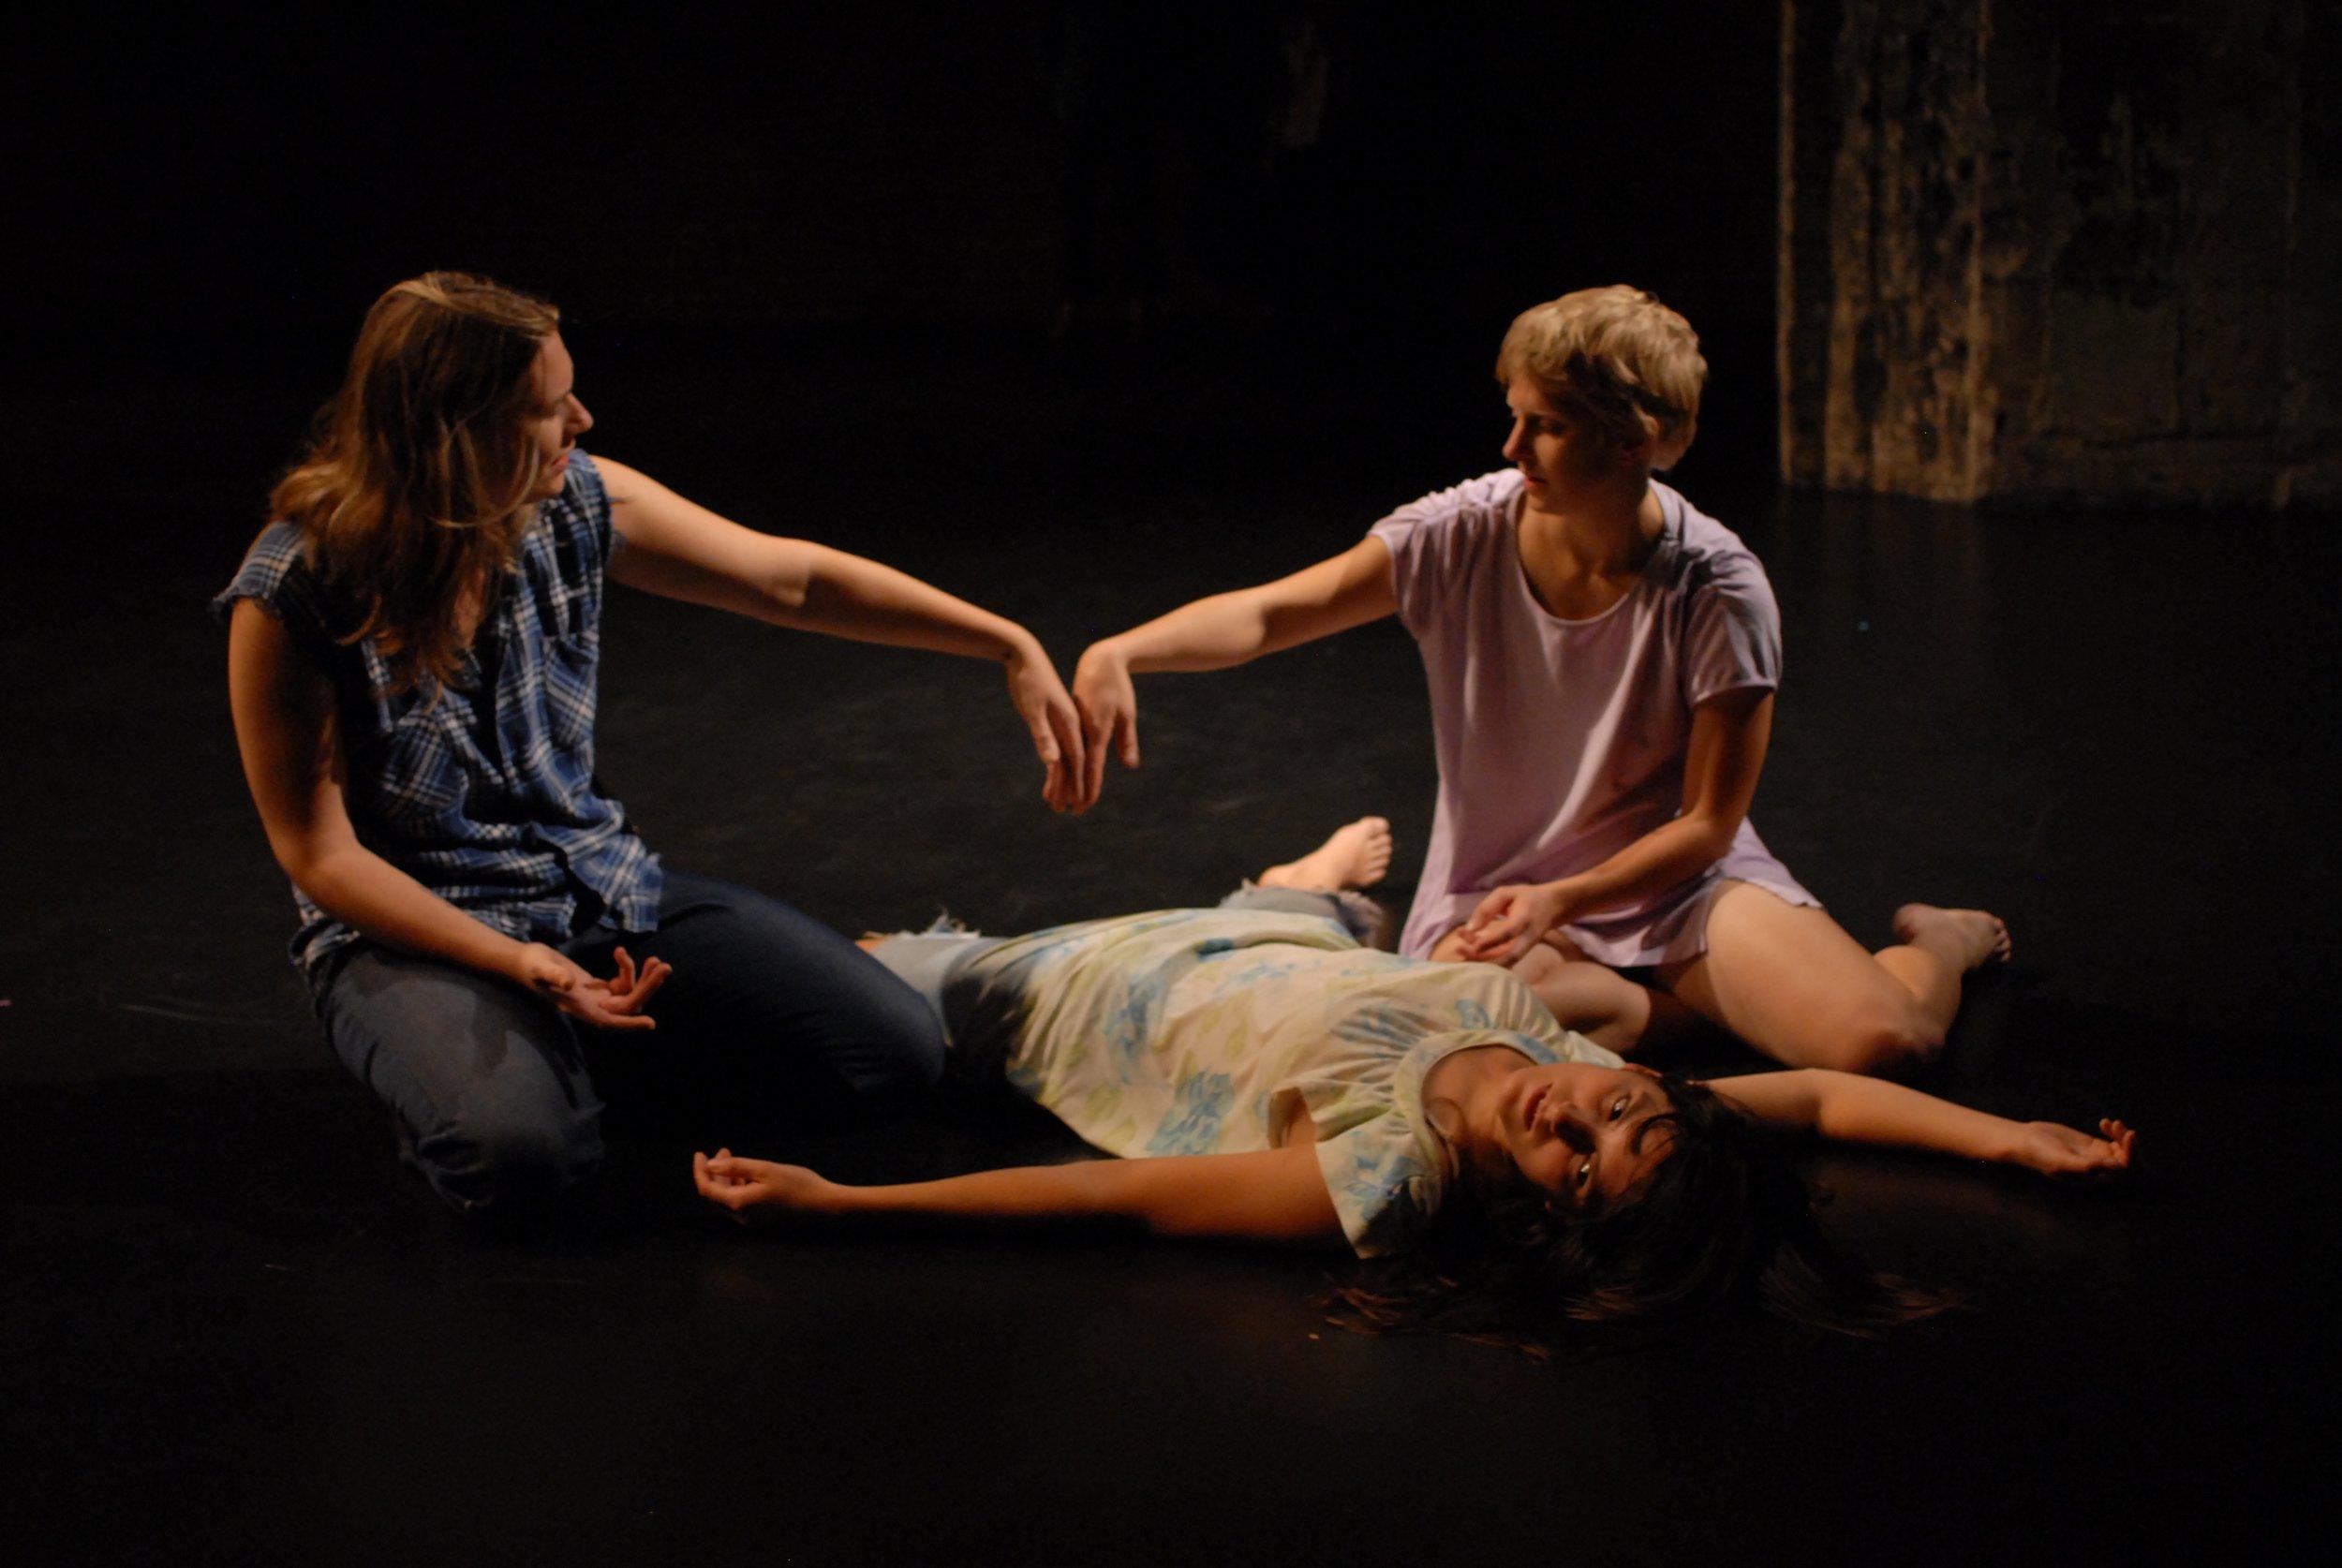 L to R: Joanna Furnans, Hannah Kramer, Anna Marie Shogren.